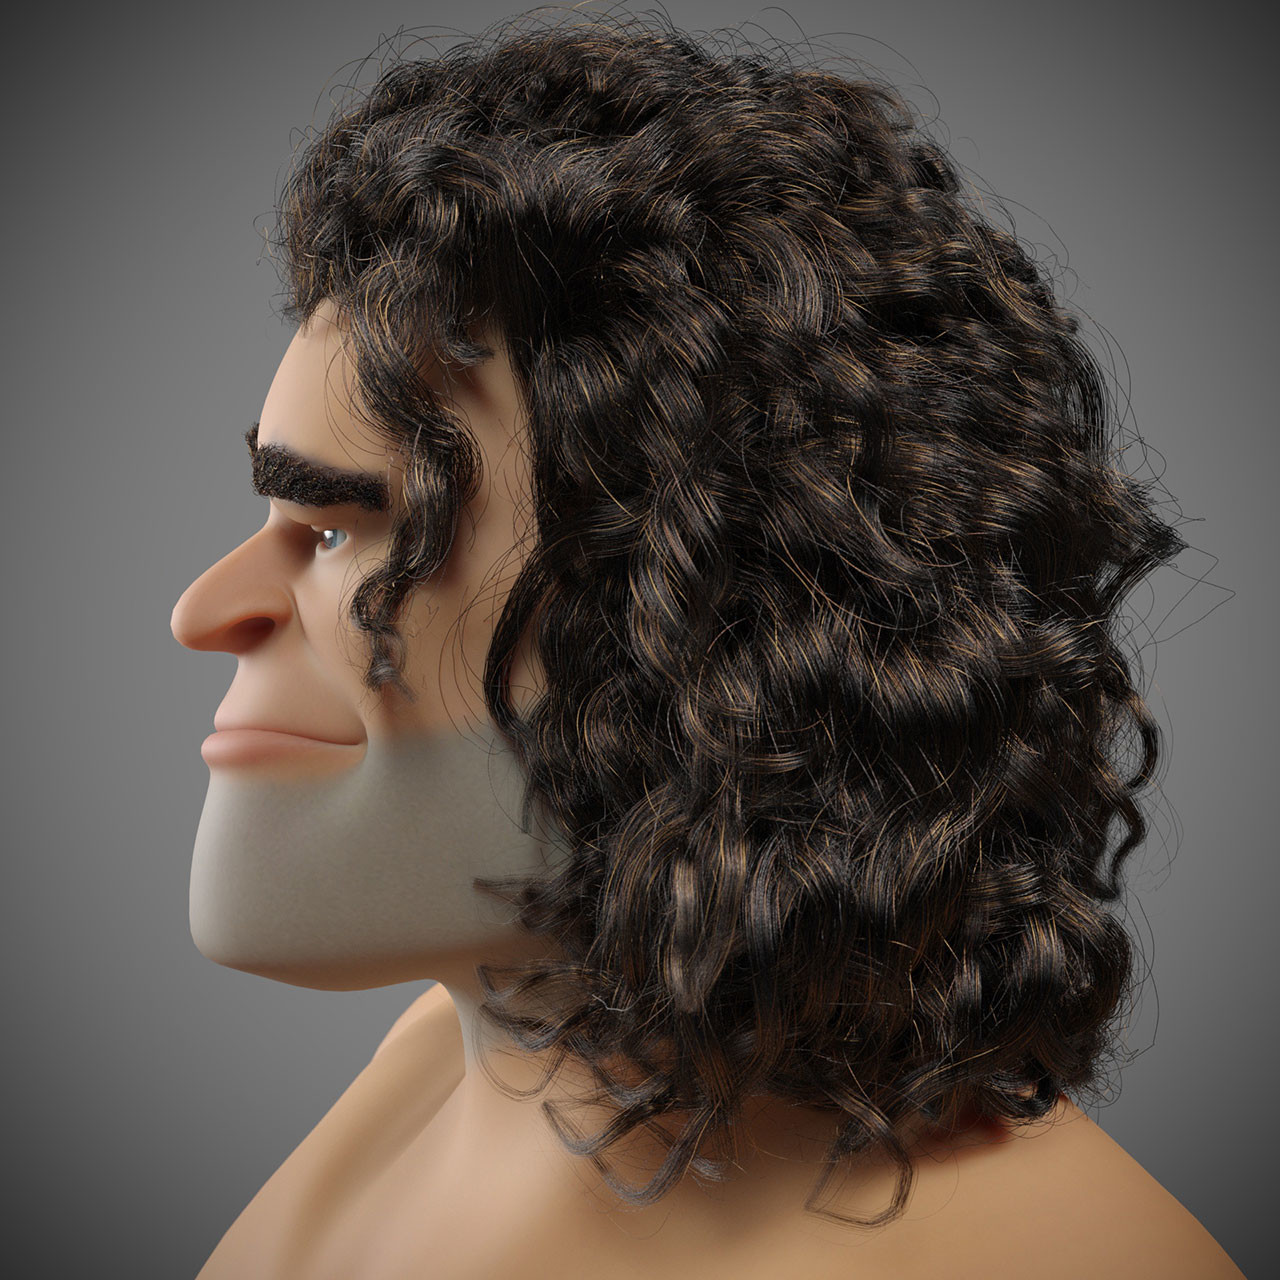 Andrew krivulya joseph hairstyle 1 r 06 by andrew krivulya